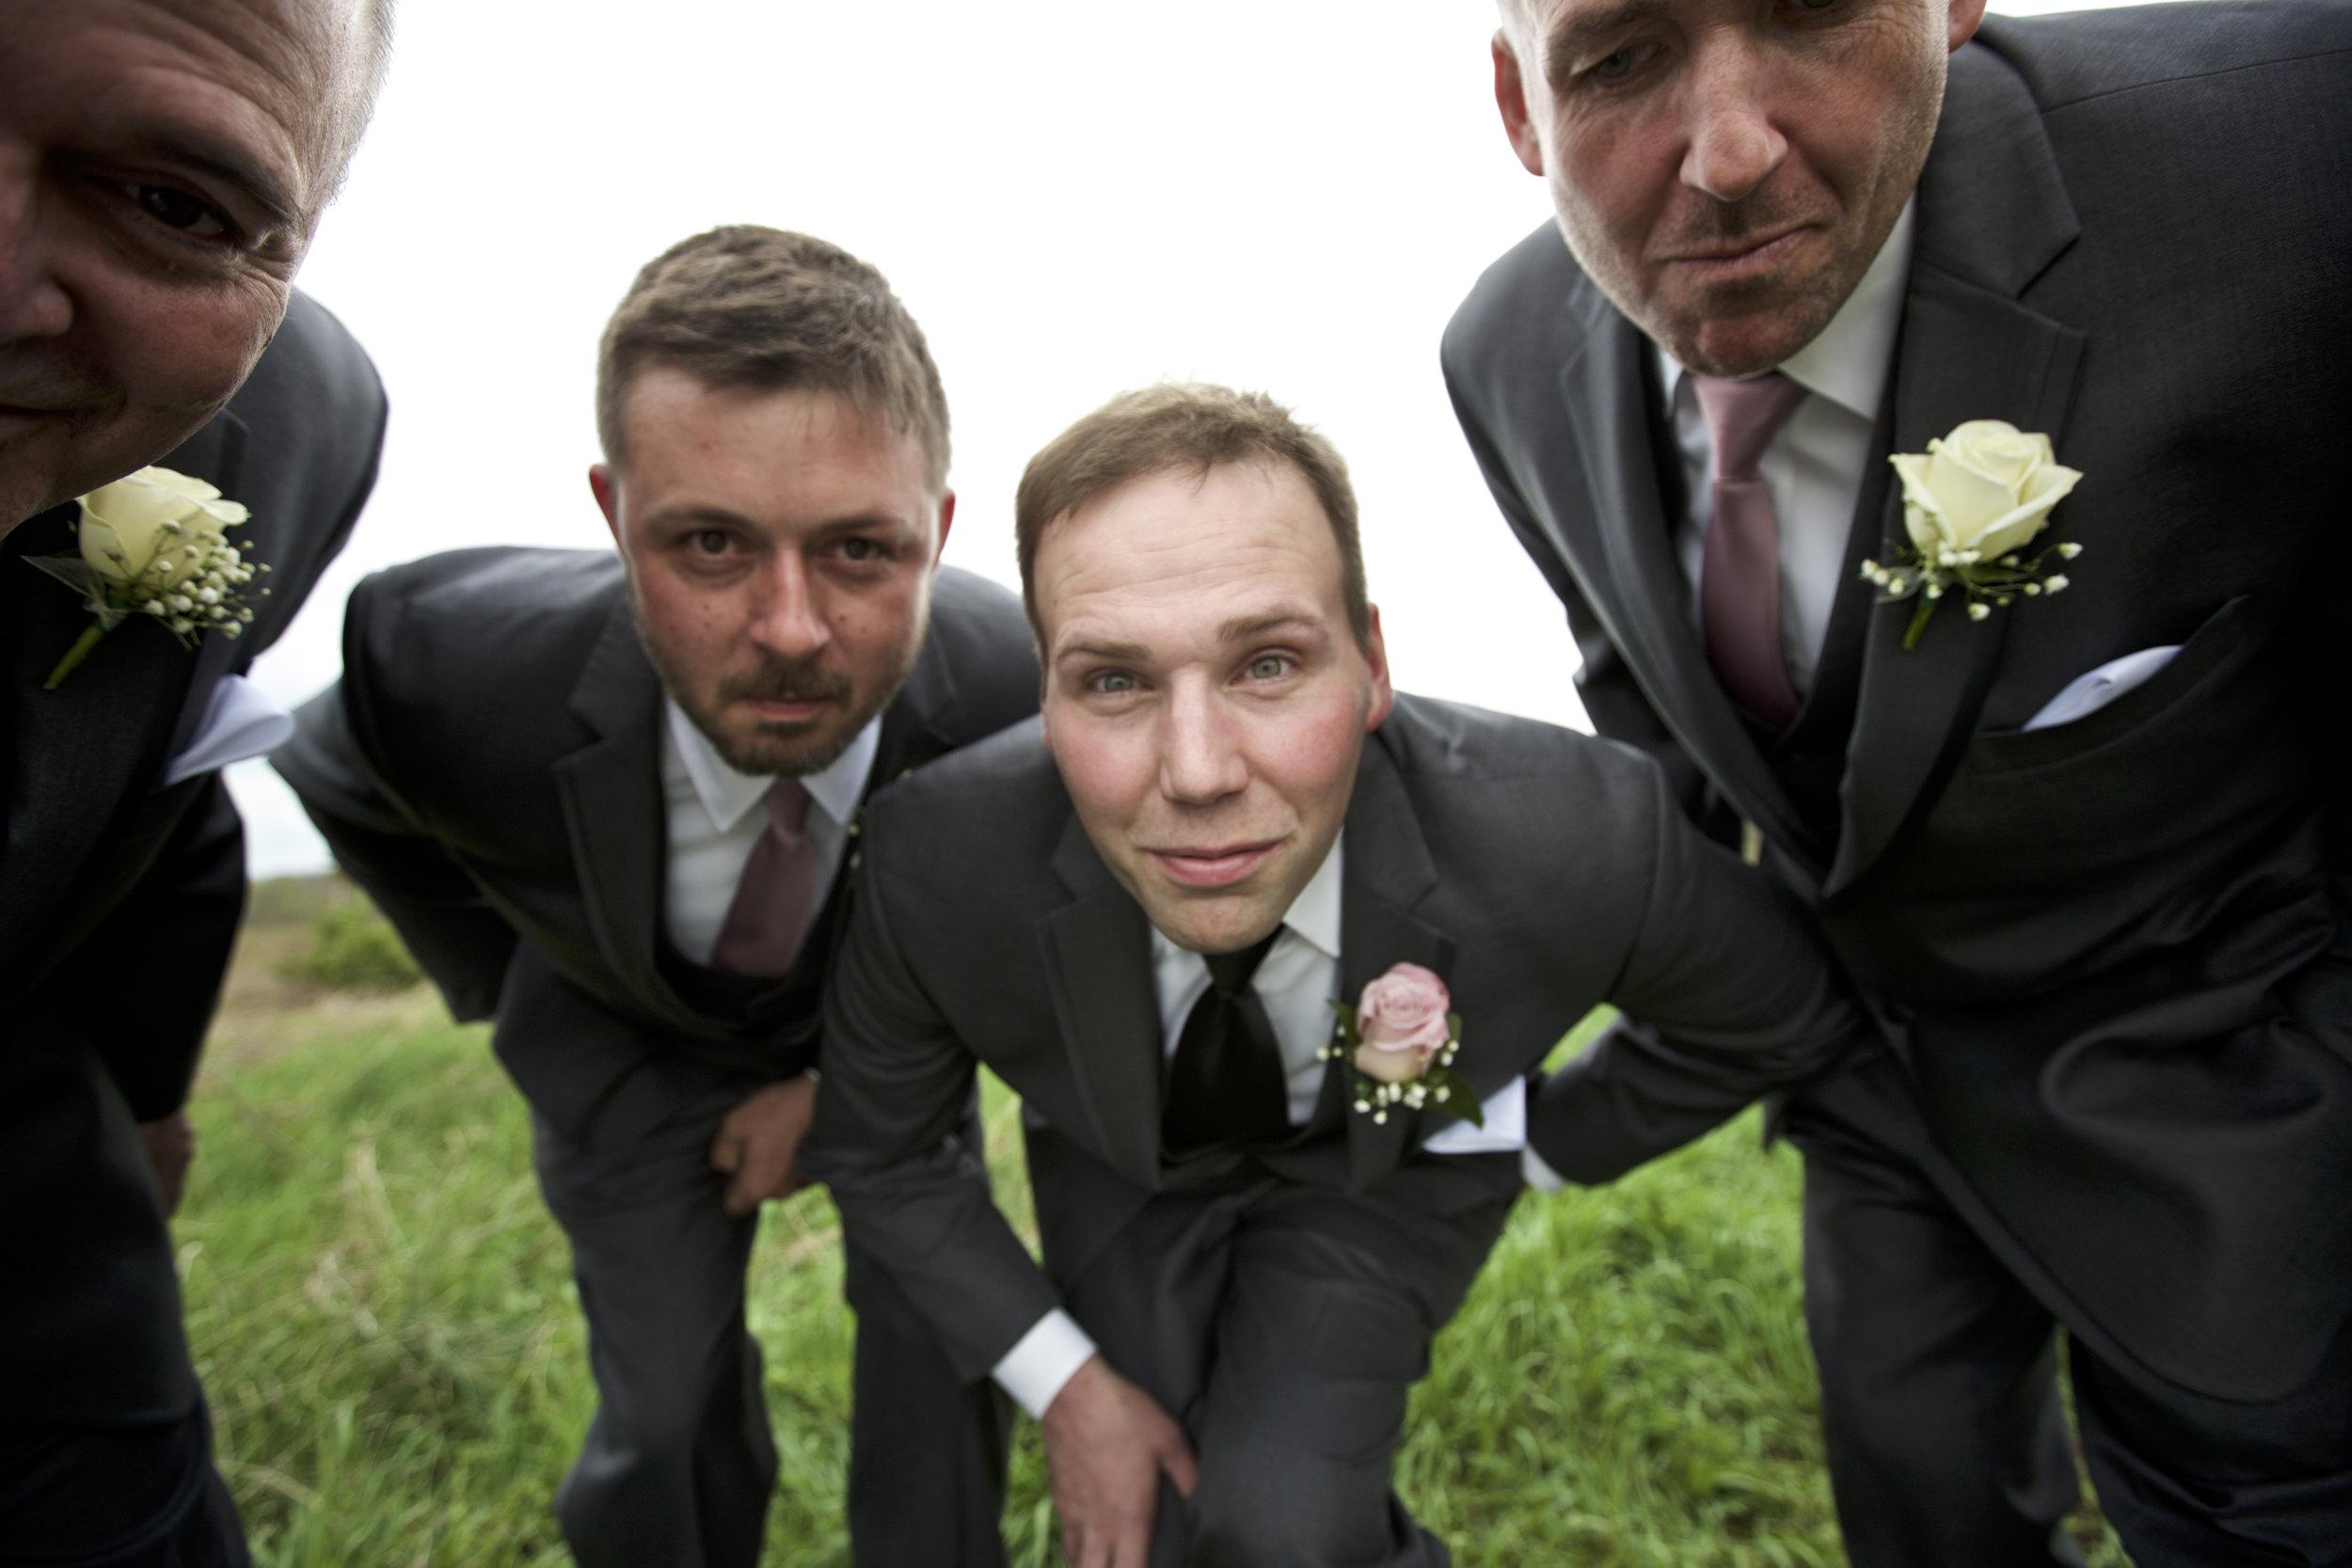 Lippincott manor wedding, wallkill ny wedding, photography, photos m.jpg